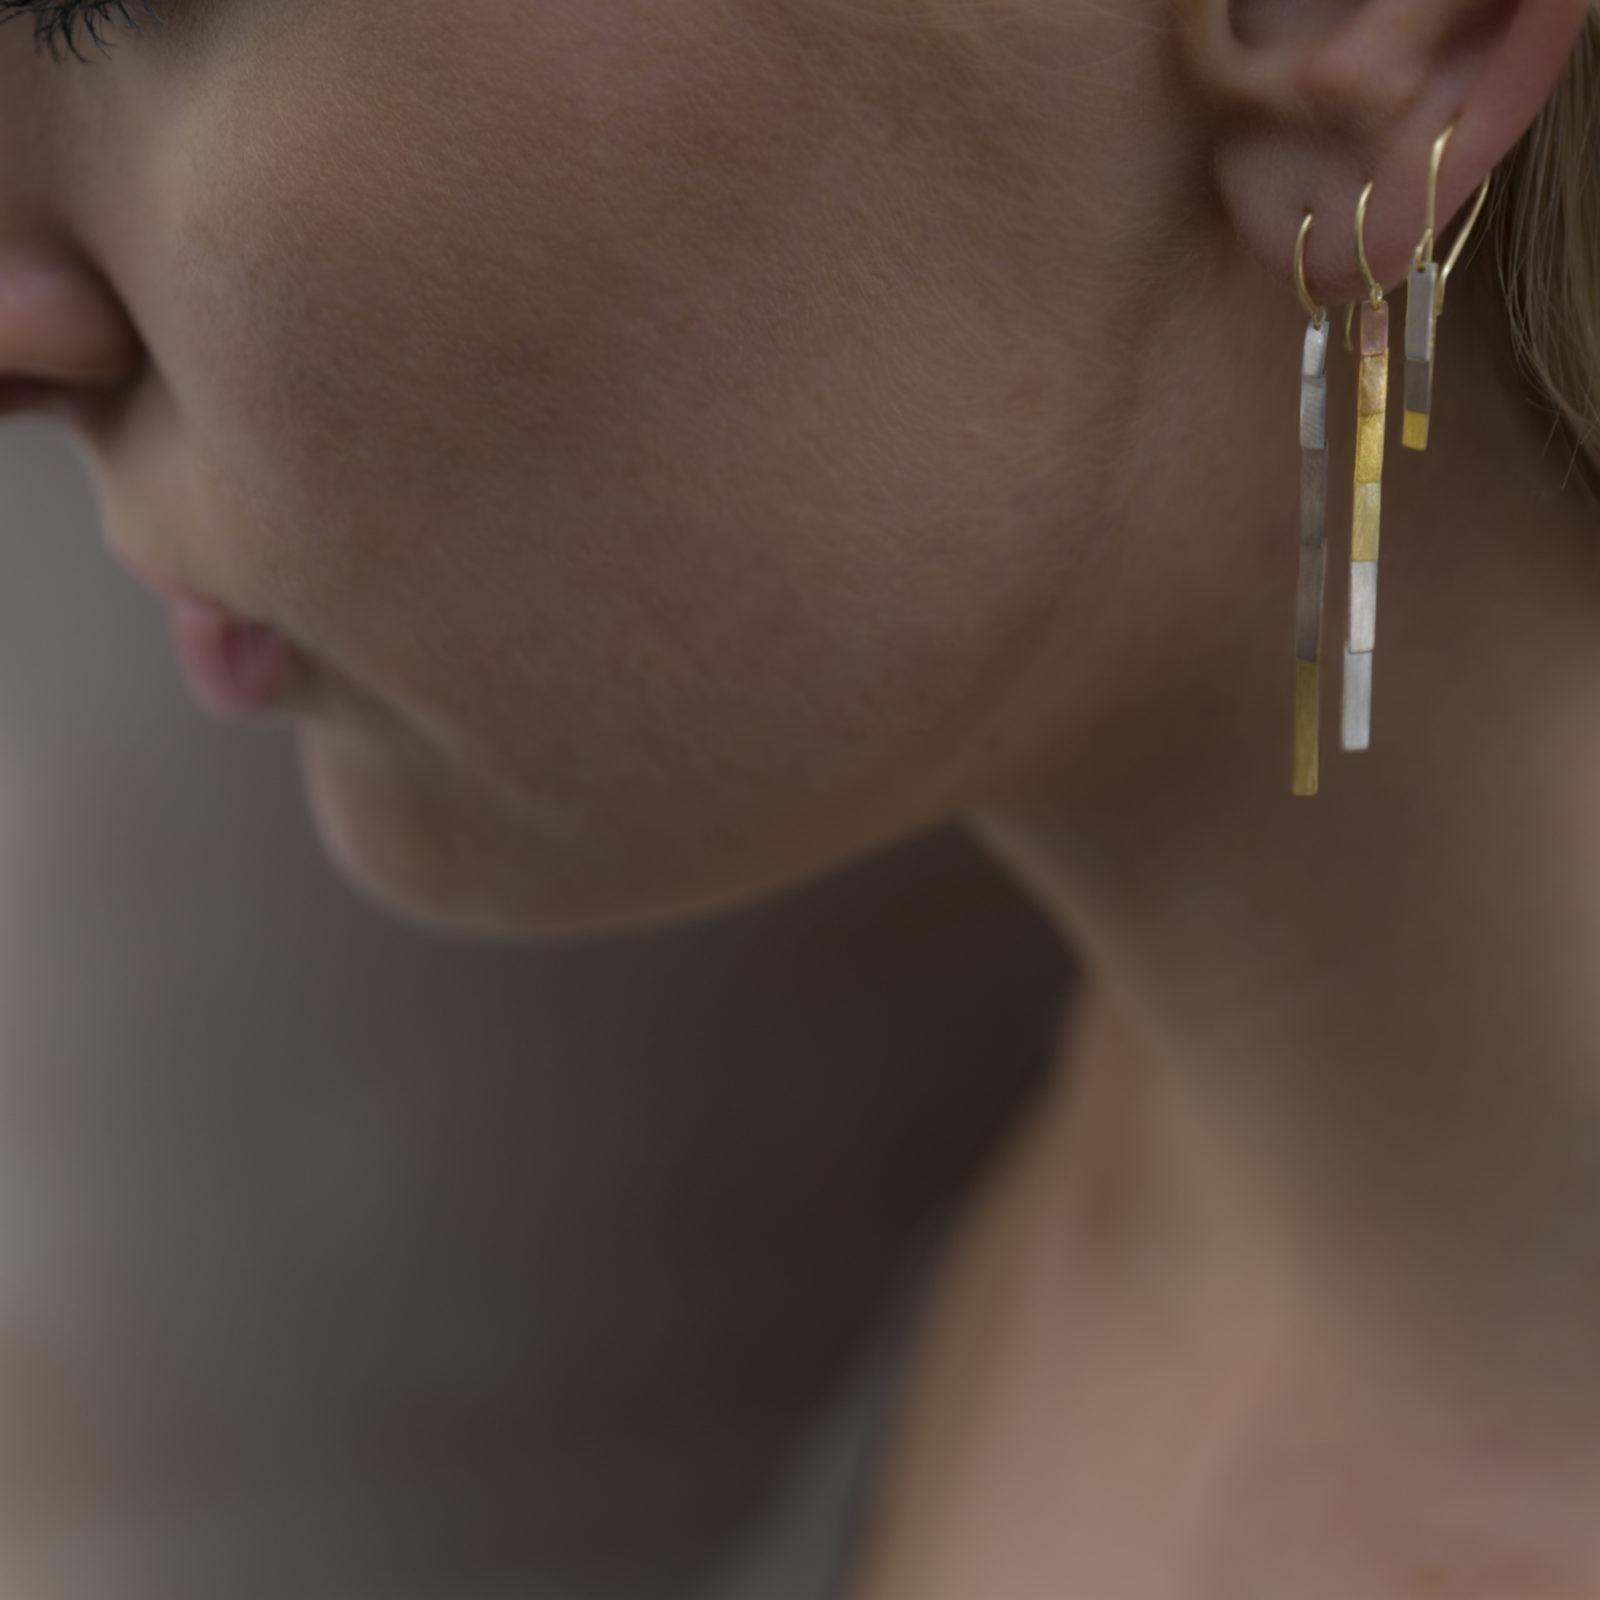 Sia Taylor KE35 YWP Tiny Rain Earring M